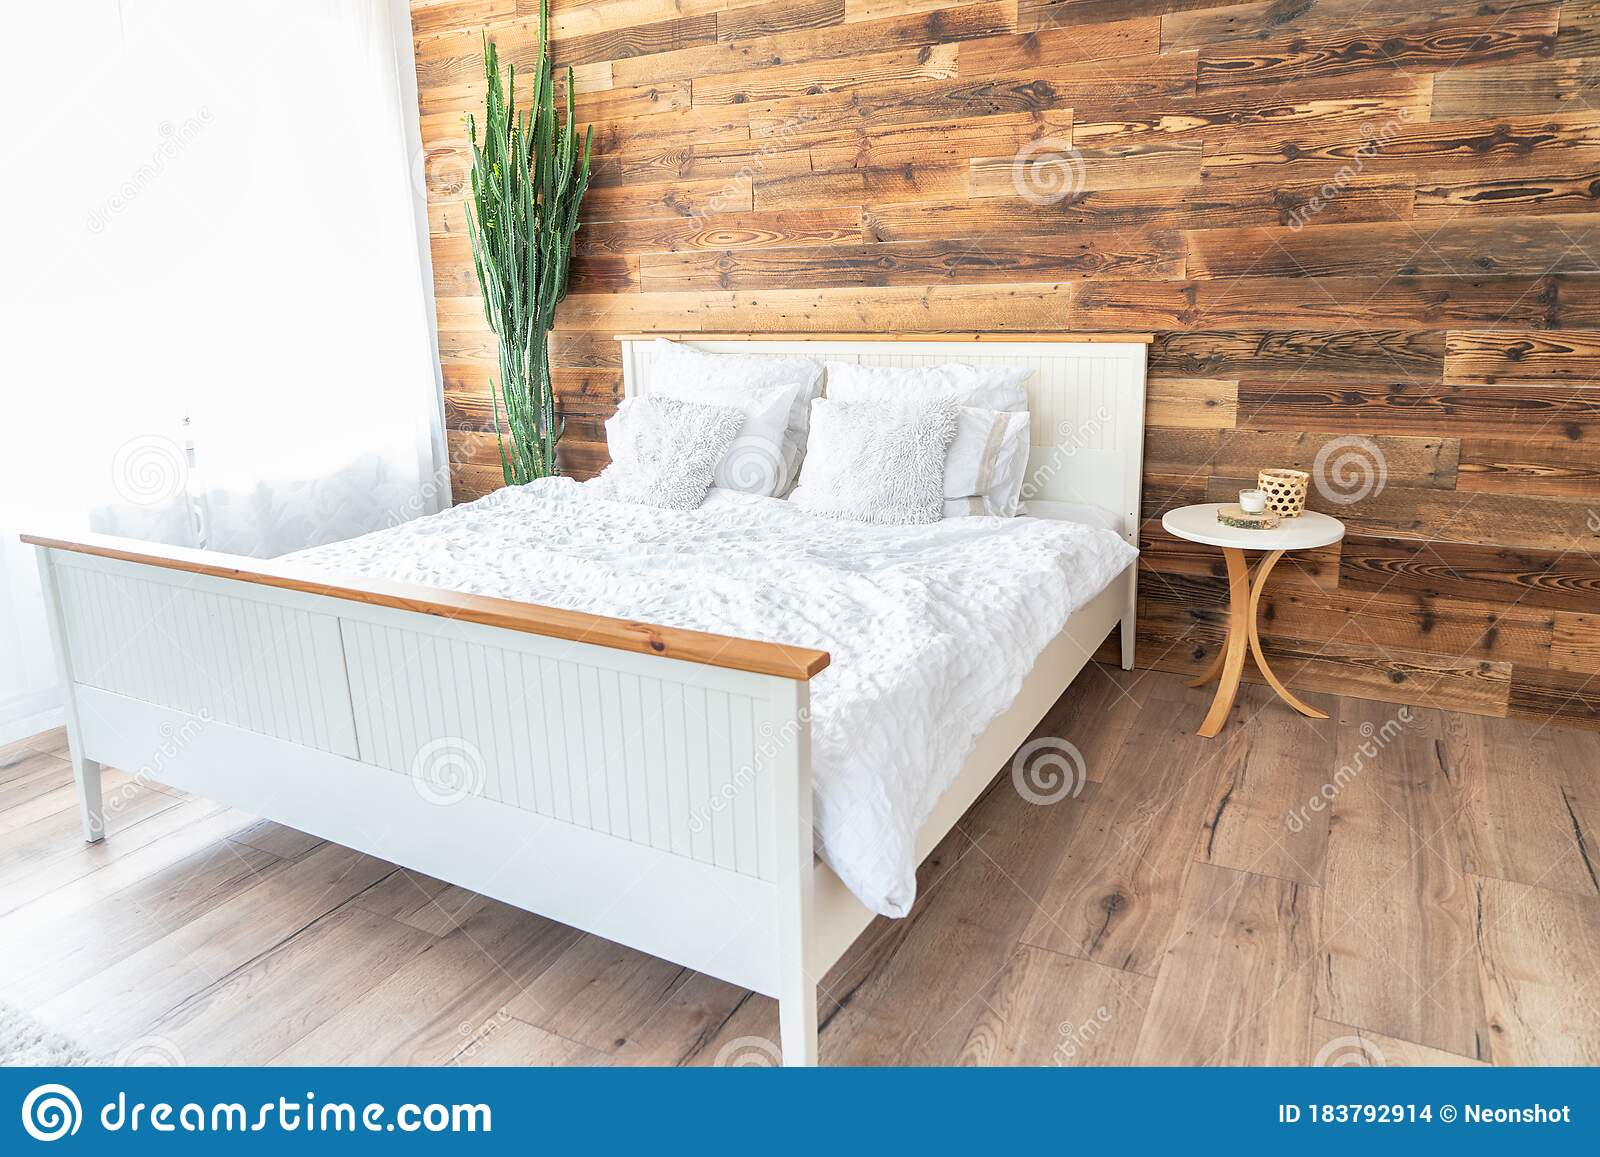 Boho Interior Style Bedroom Stock Photo Image Of Bedroom Living 183792914